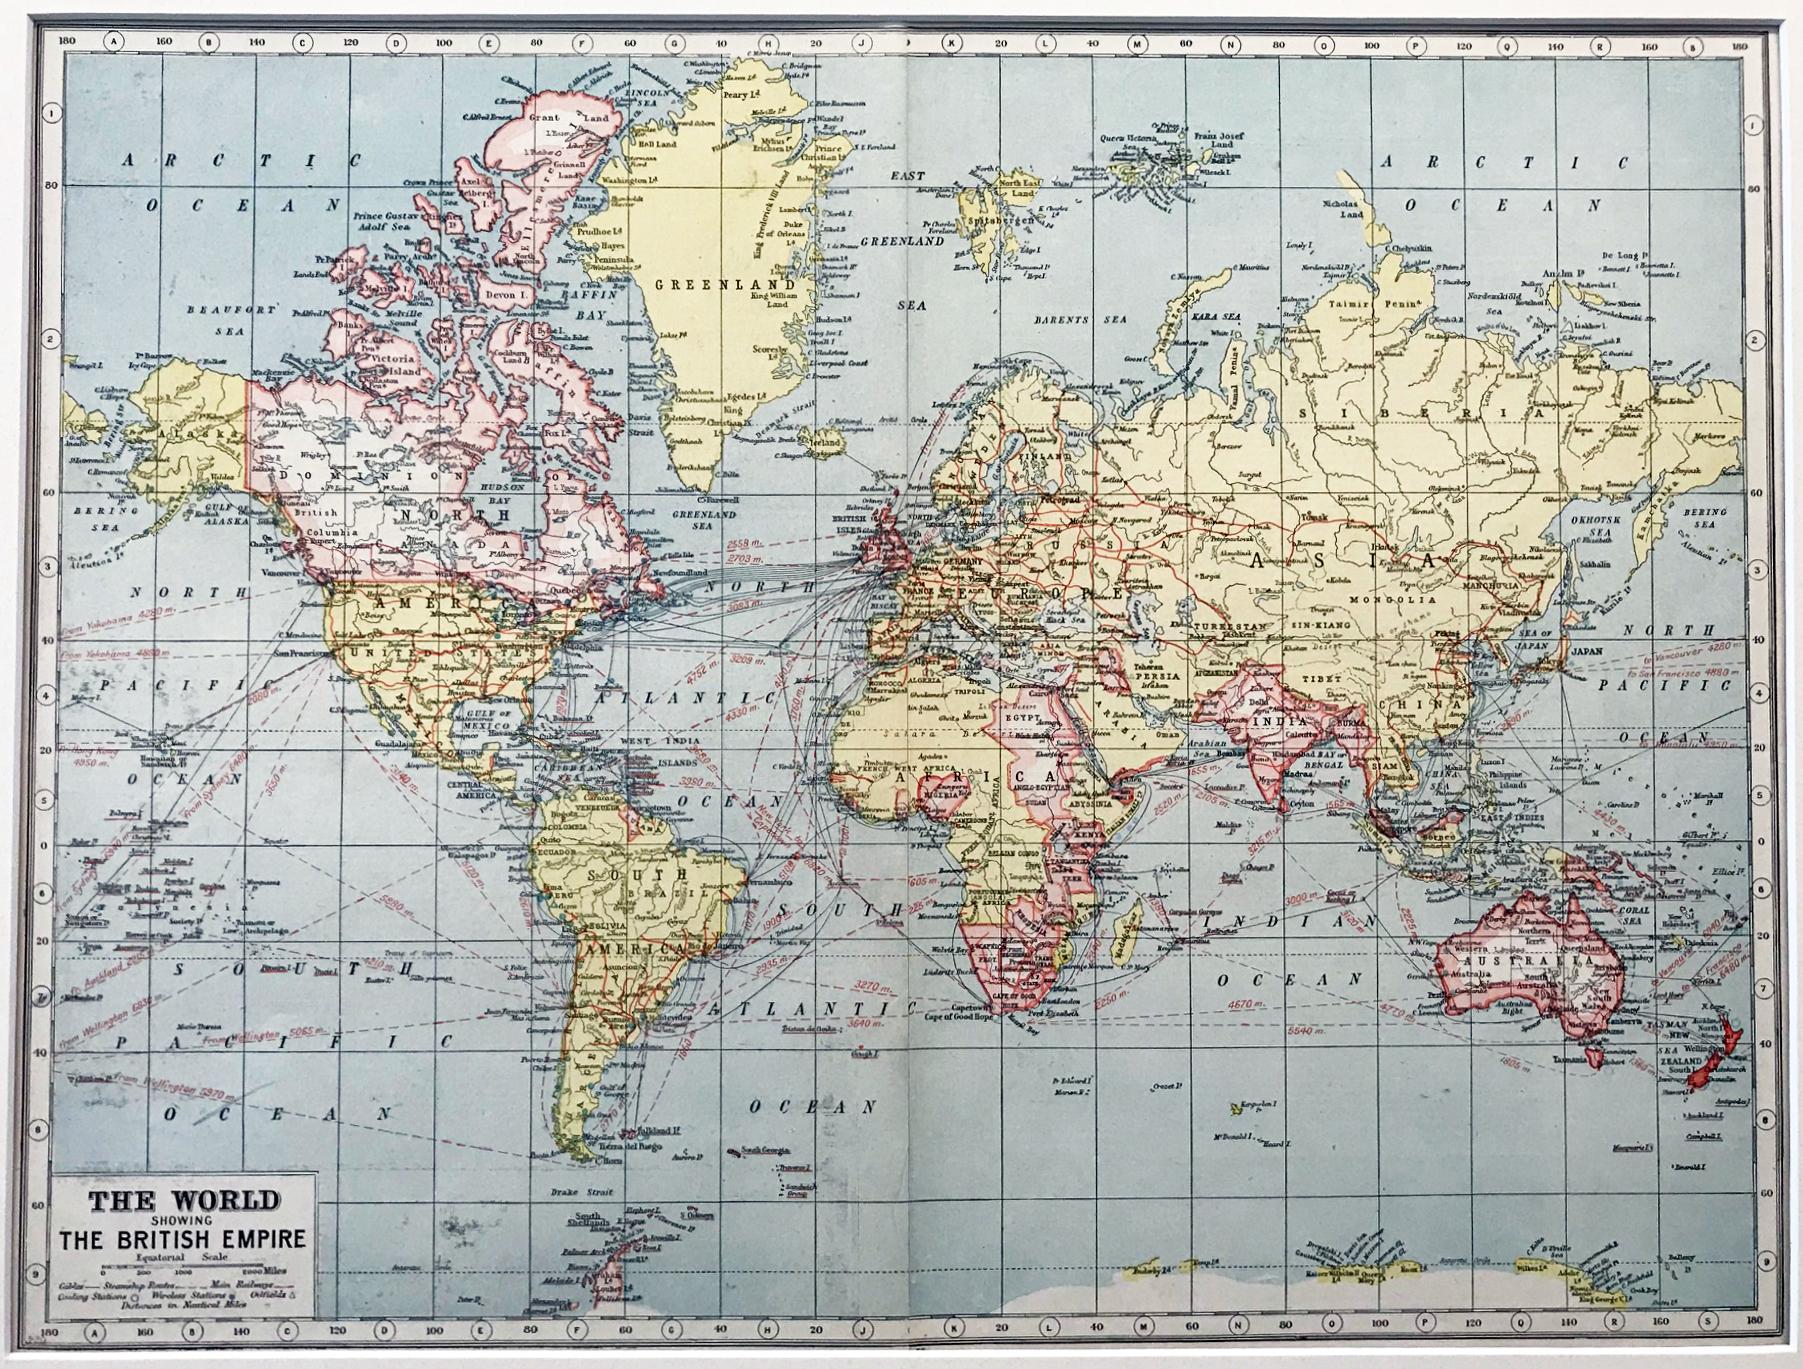 1920 World - Showing The British Empire